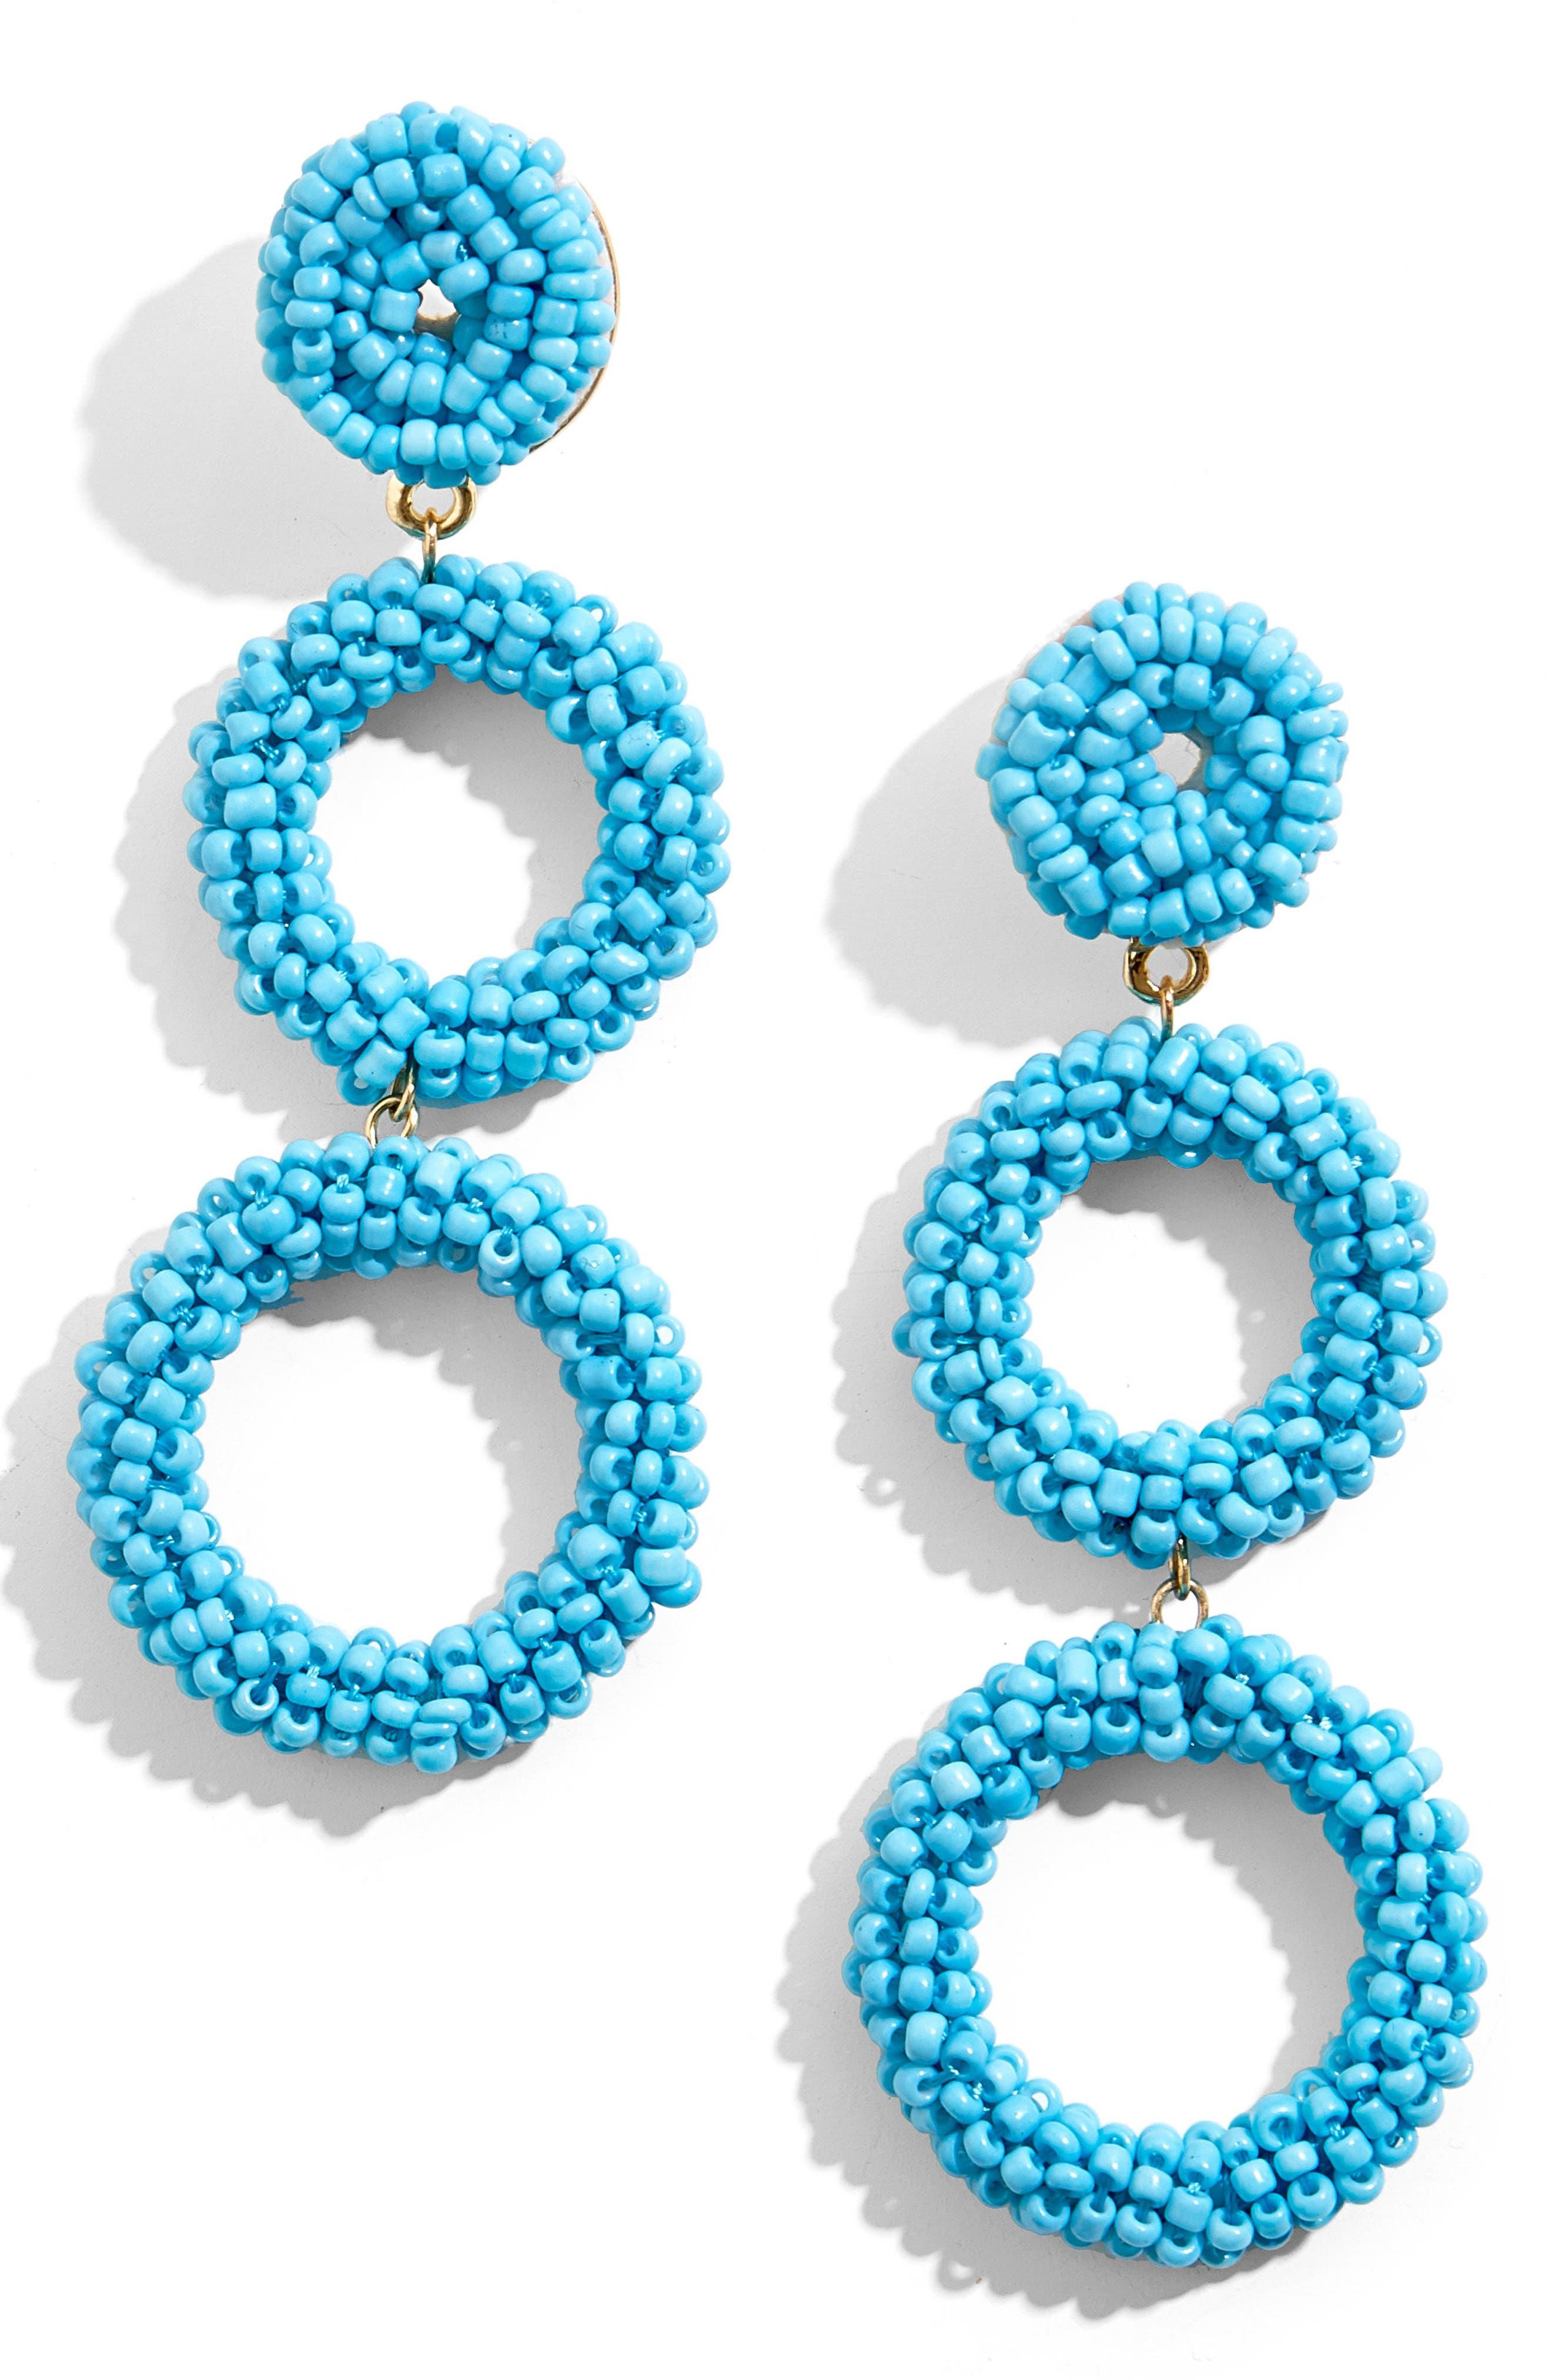 Capella Beaded Triple Hoop Drop Earrings,                             Main thumbnail 1, color,                             TURQUOISE